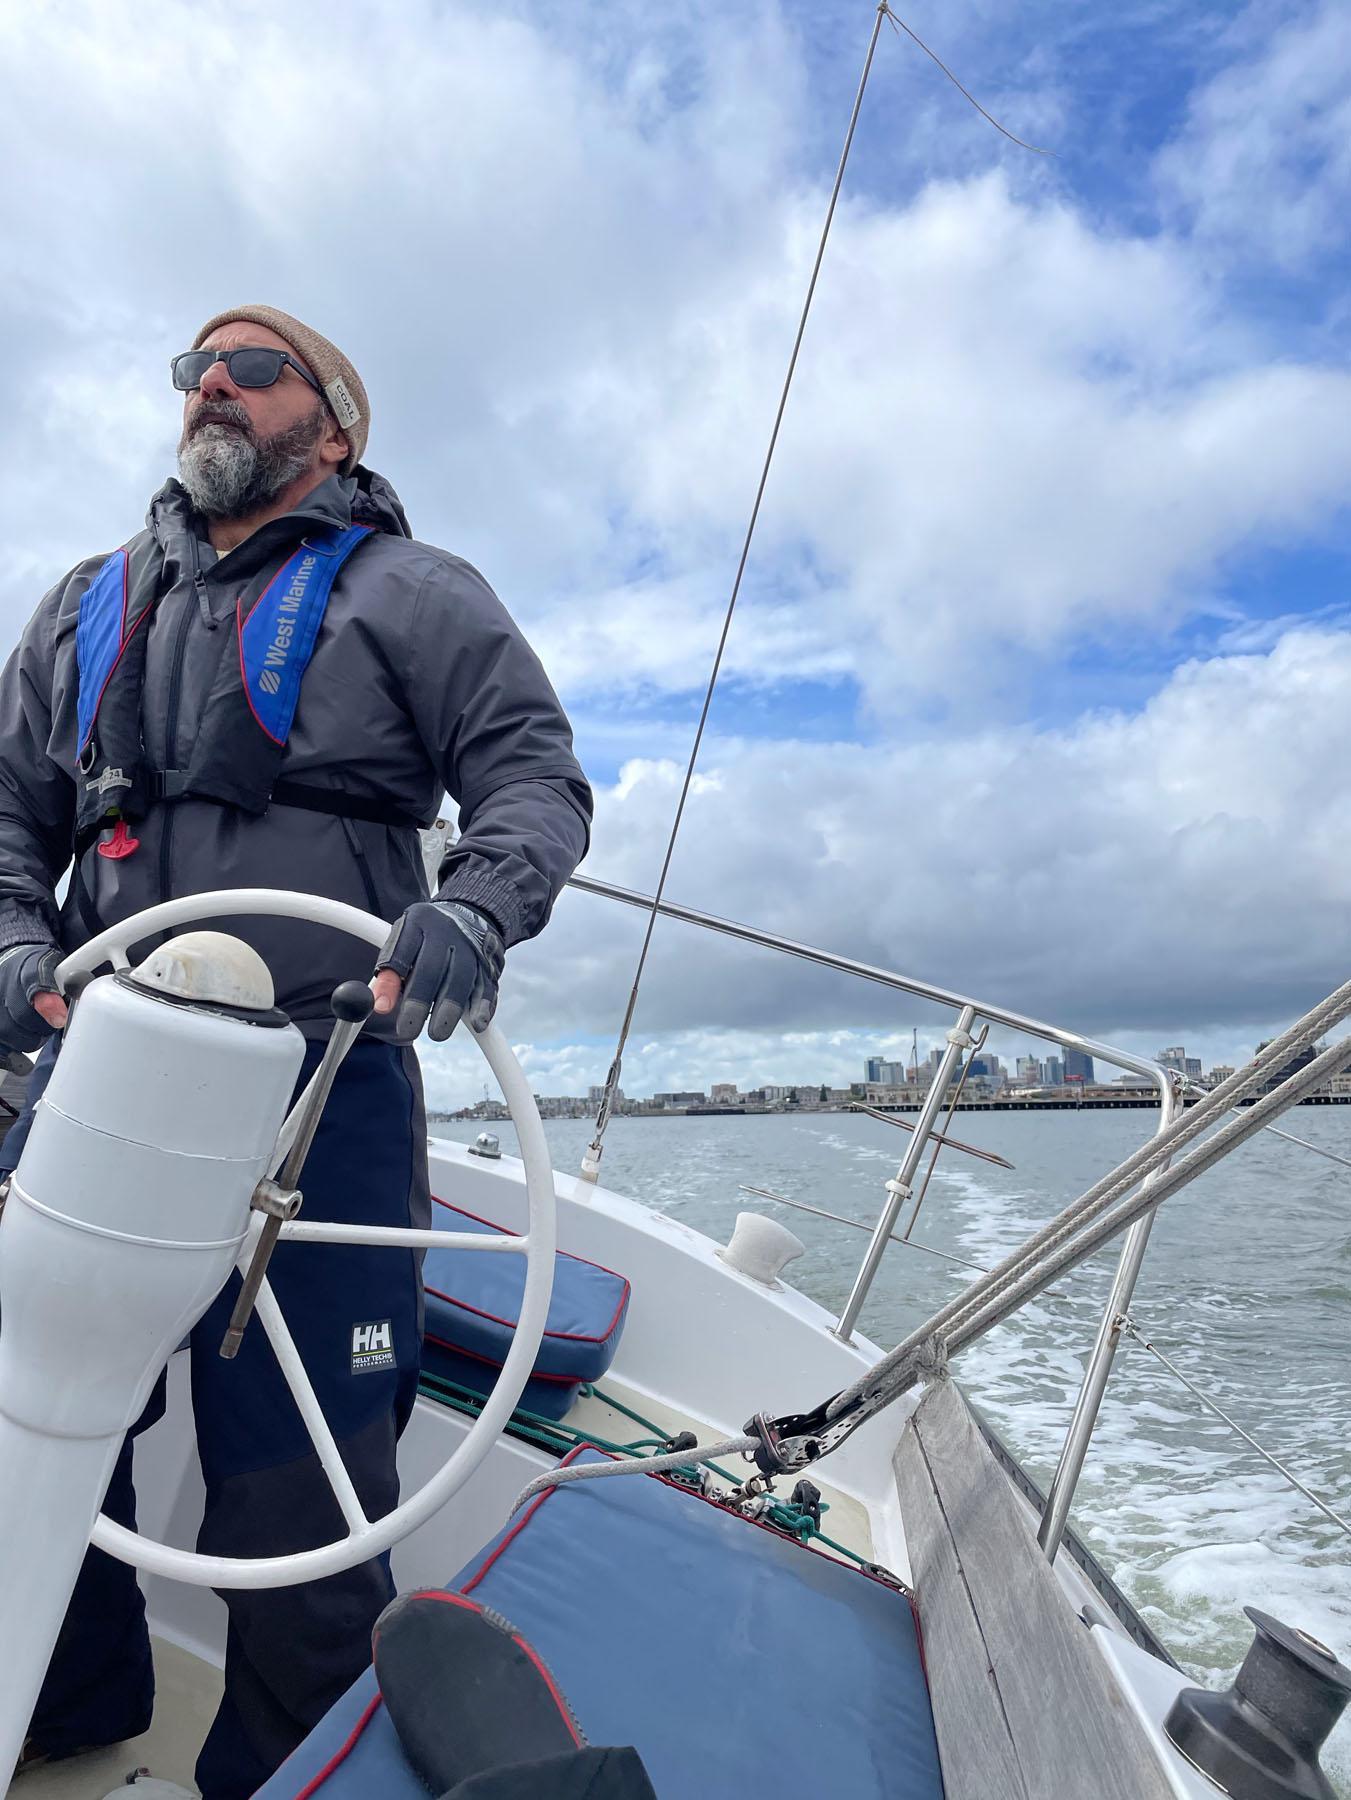 Roger Nunez aboard Summer Sailstice